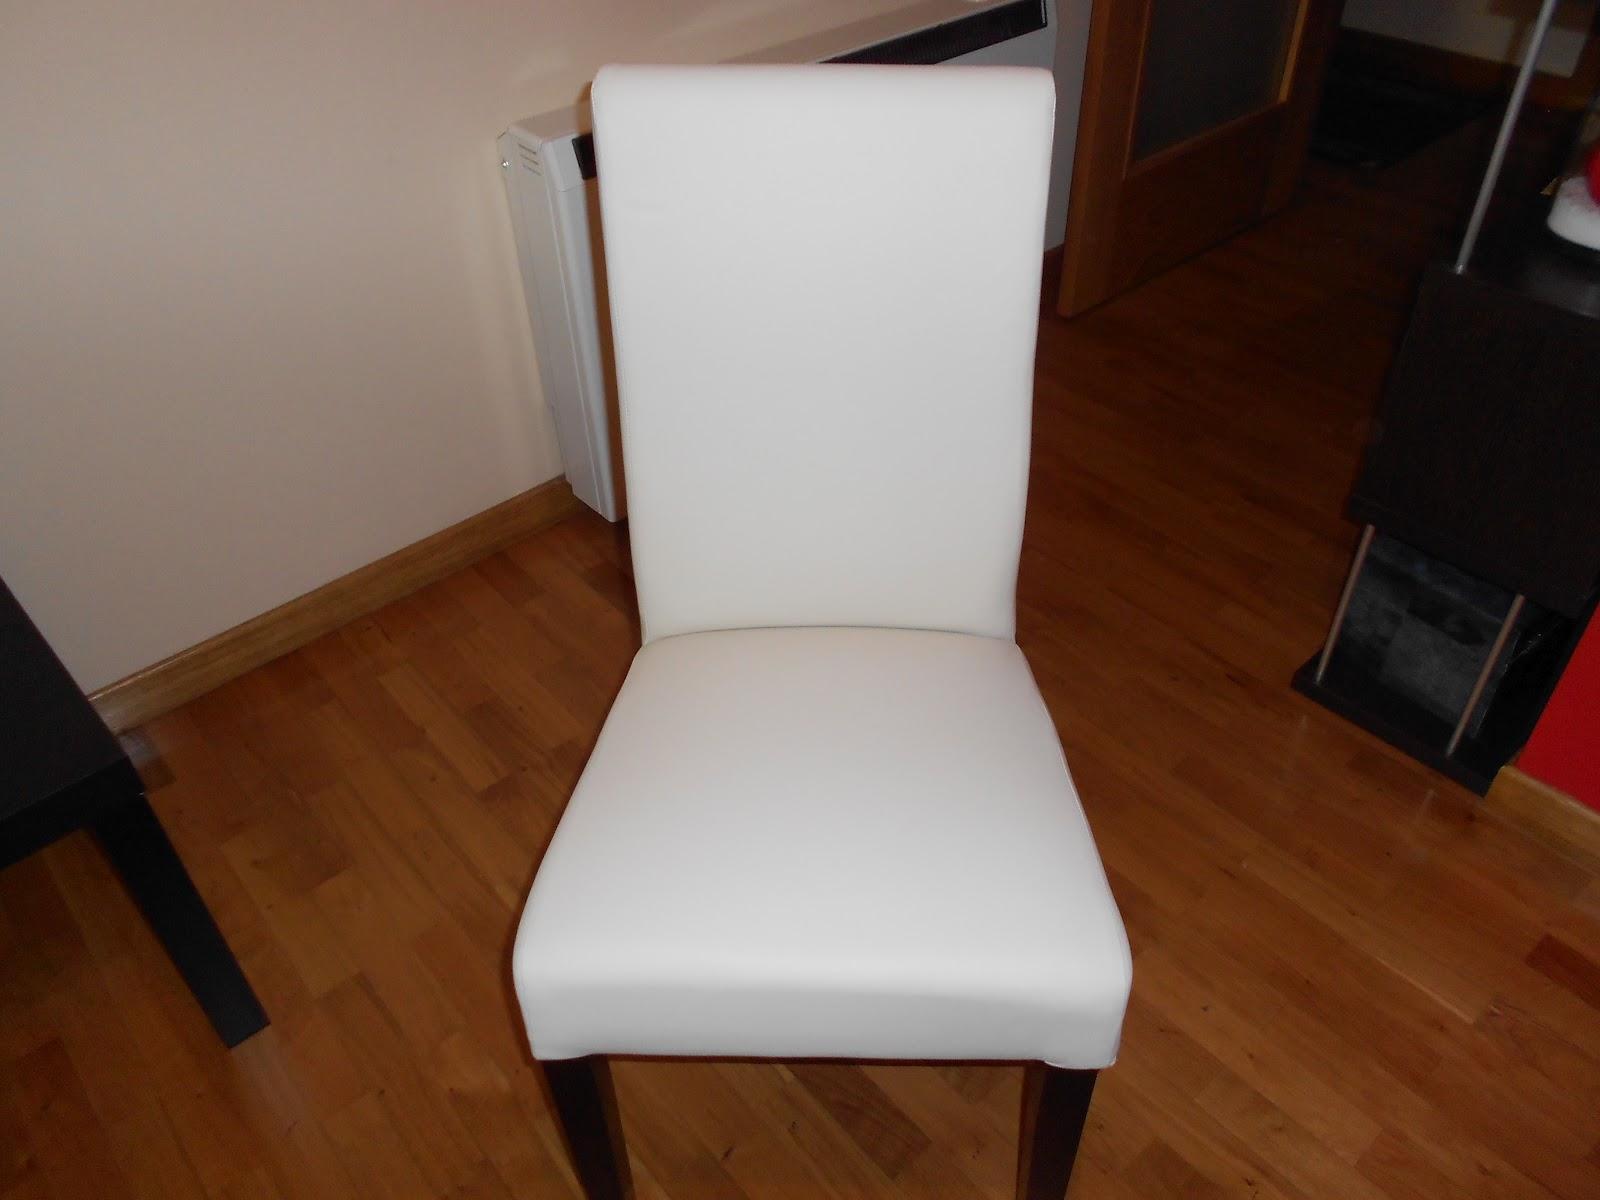 Comprar ofertas platos de ducha muebles sofas spain for Fundas para sillas comedor